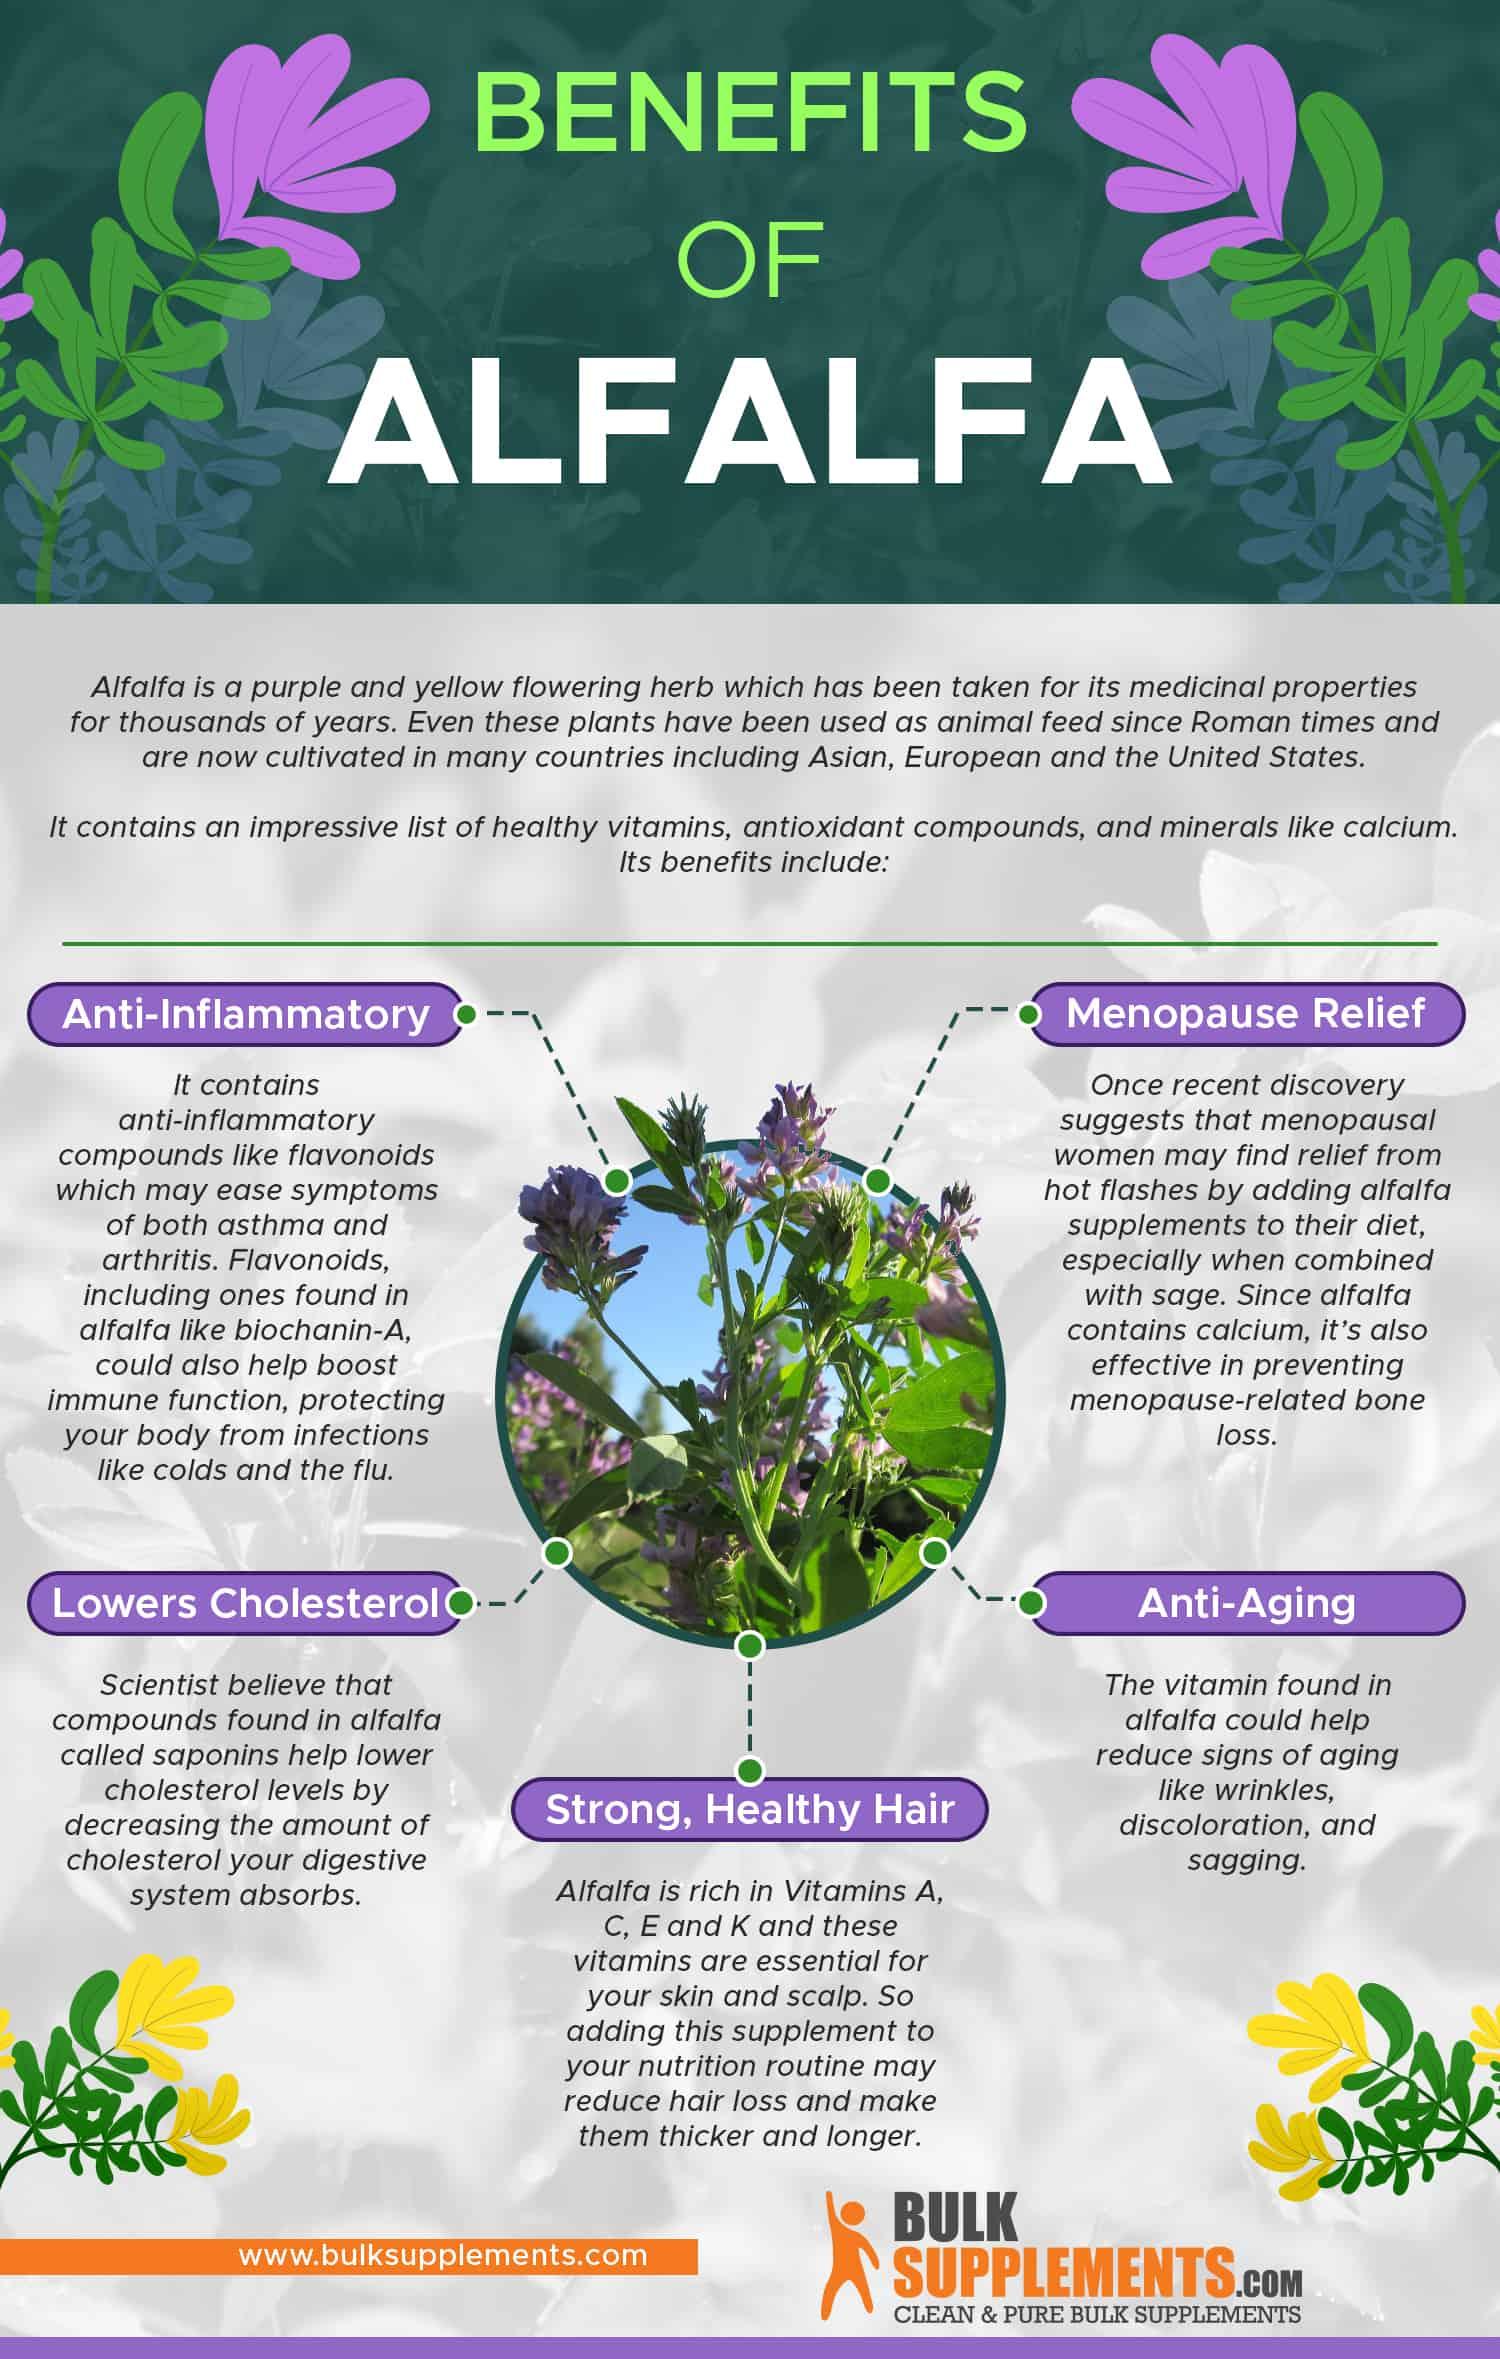 Benefits of Alfalfa